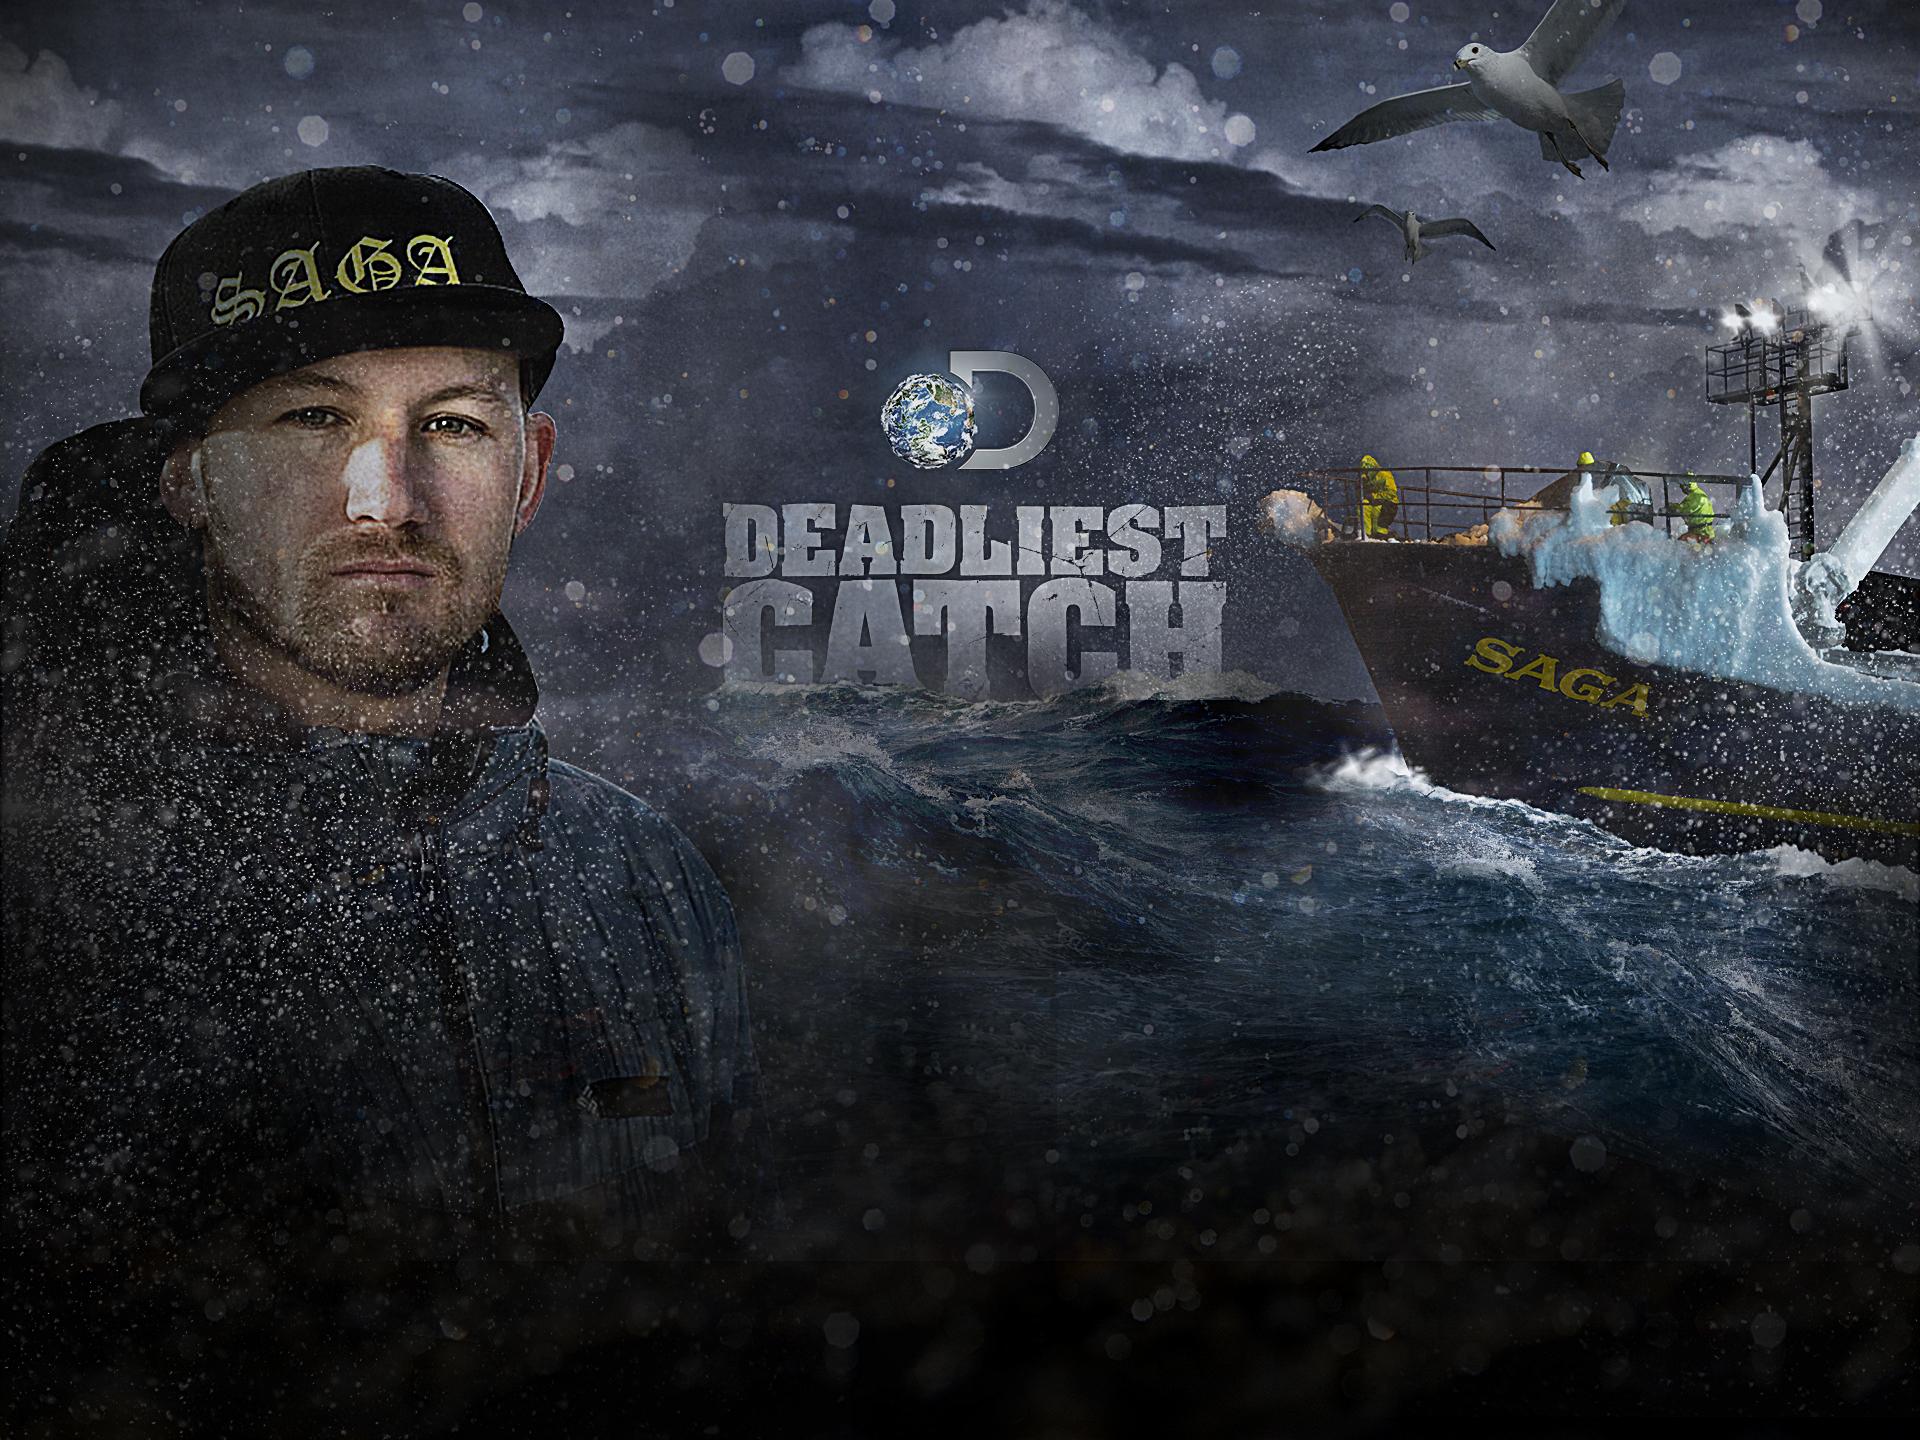 Deadliest Catch Raw Saga Discovery Channel 1920x1440